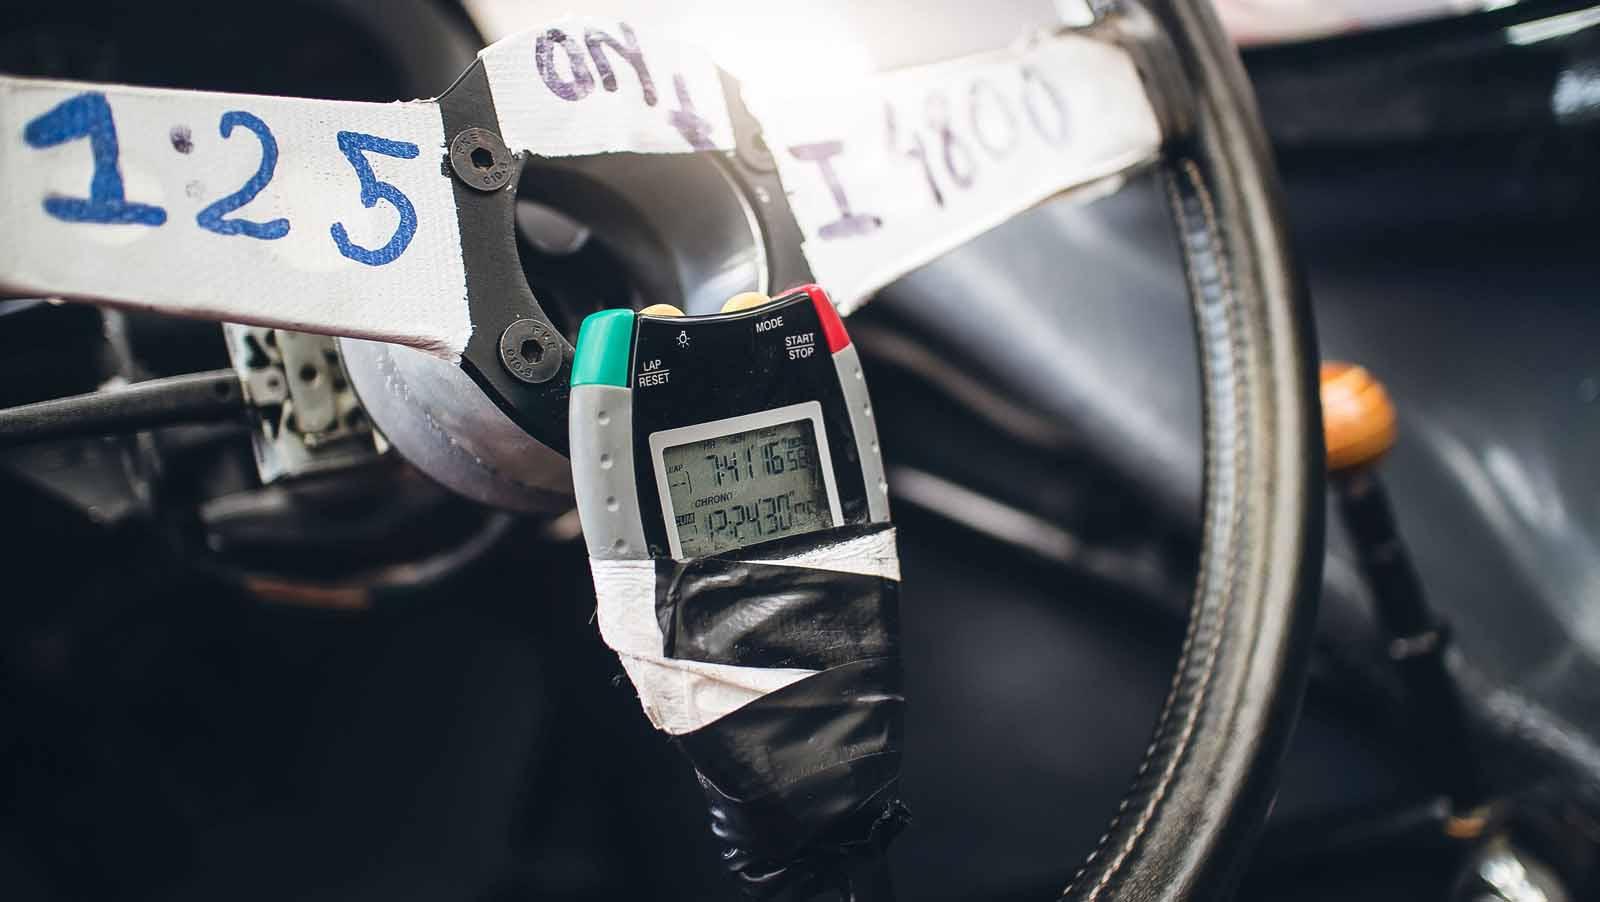 2015 Audi Sport TT Cup Norisring 544 110x60 photo